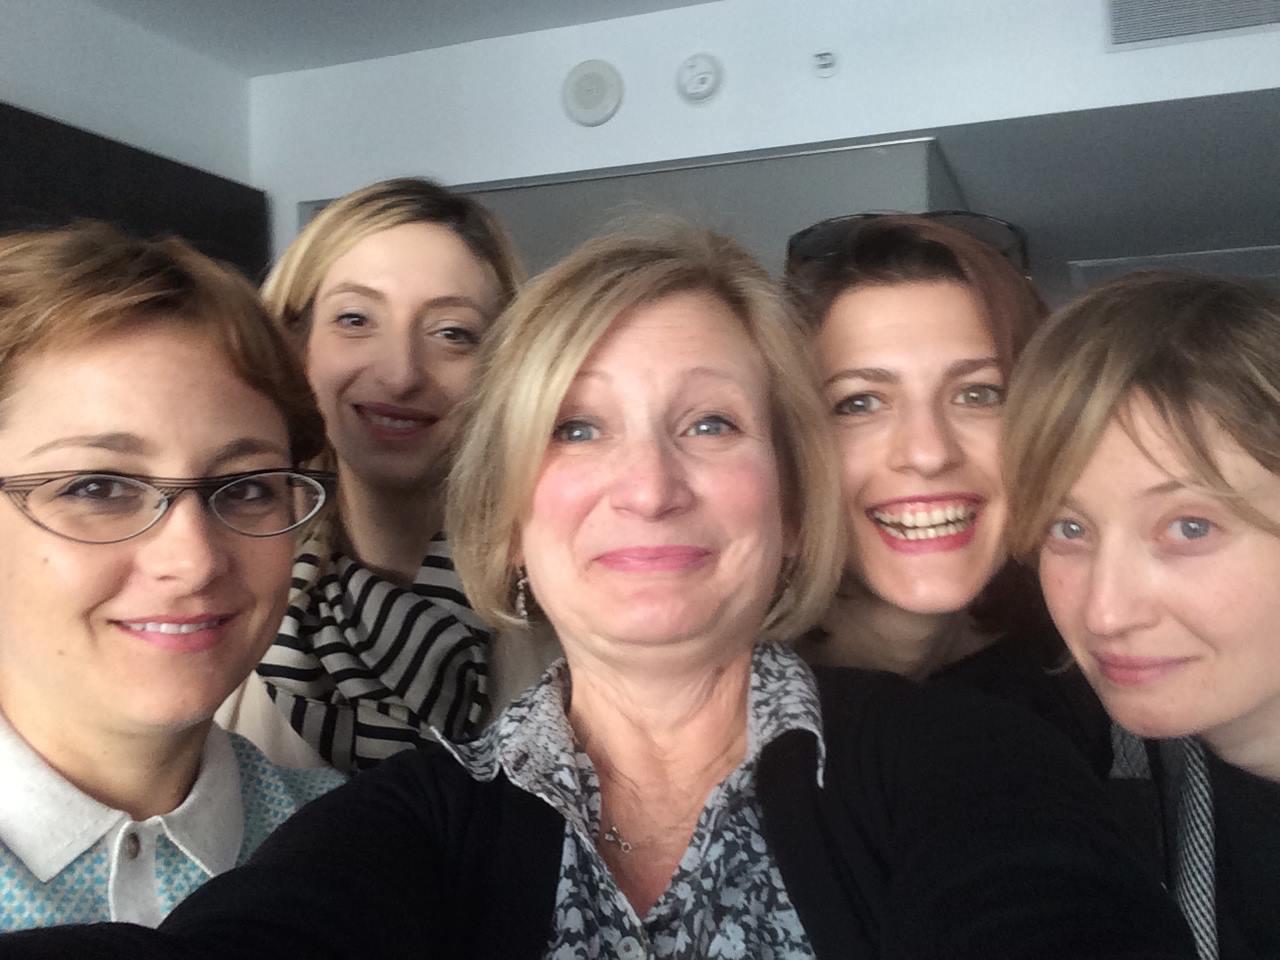 Vergine Giurata: DIrector Laura Bispuri, Producer Marta Donzelli, Actresses Flonja Kodheli and Alba Rohrwacher